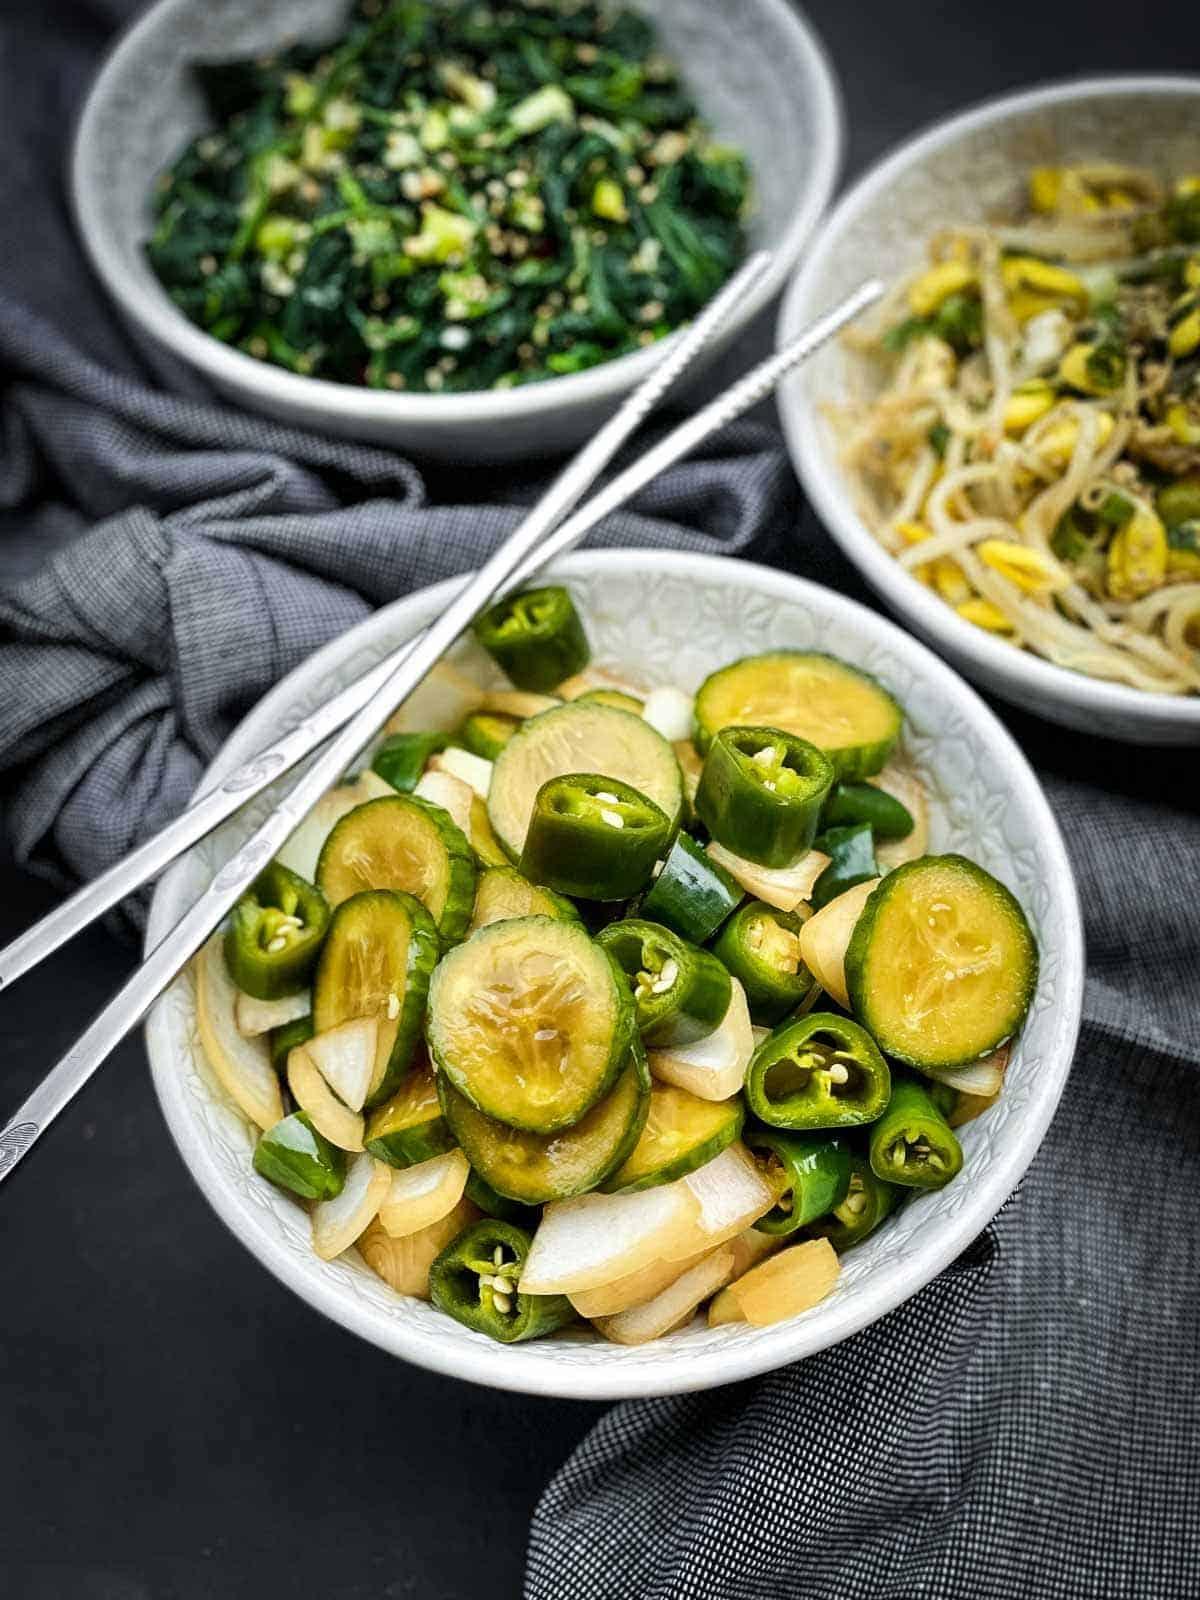 Korean Pickles in Soy Sauce - Jangajji